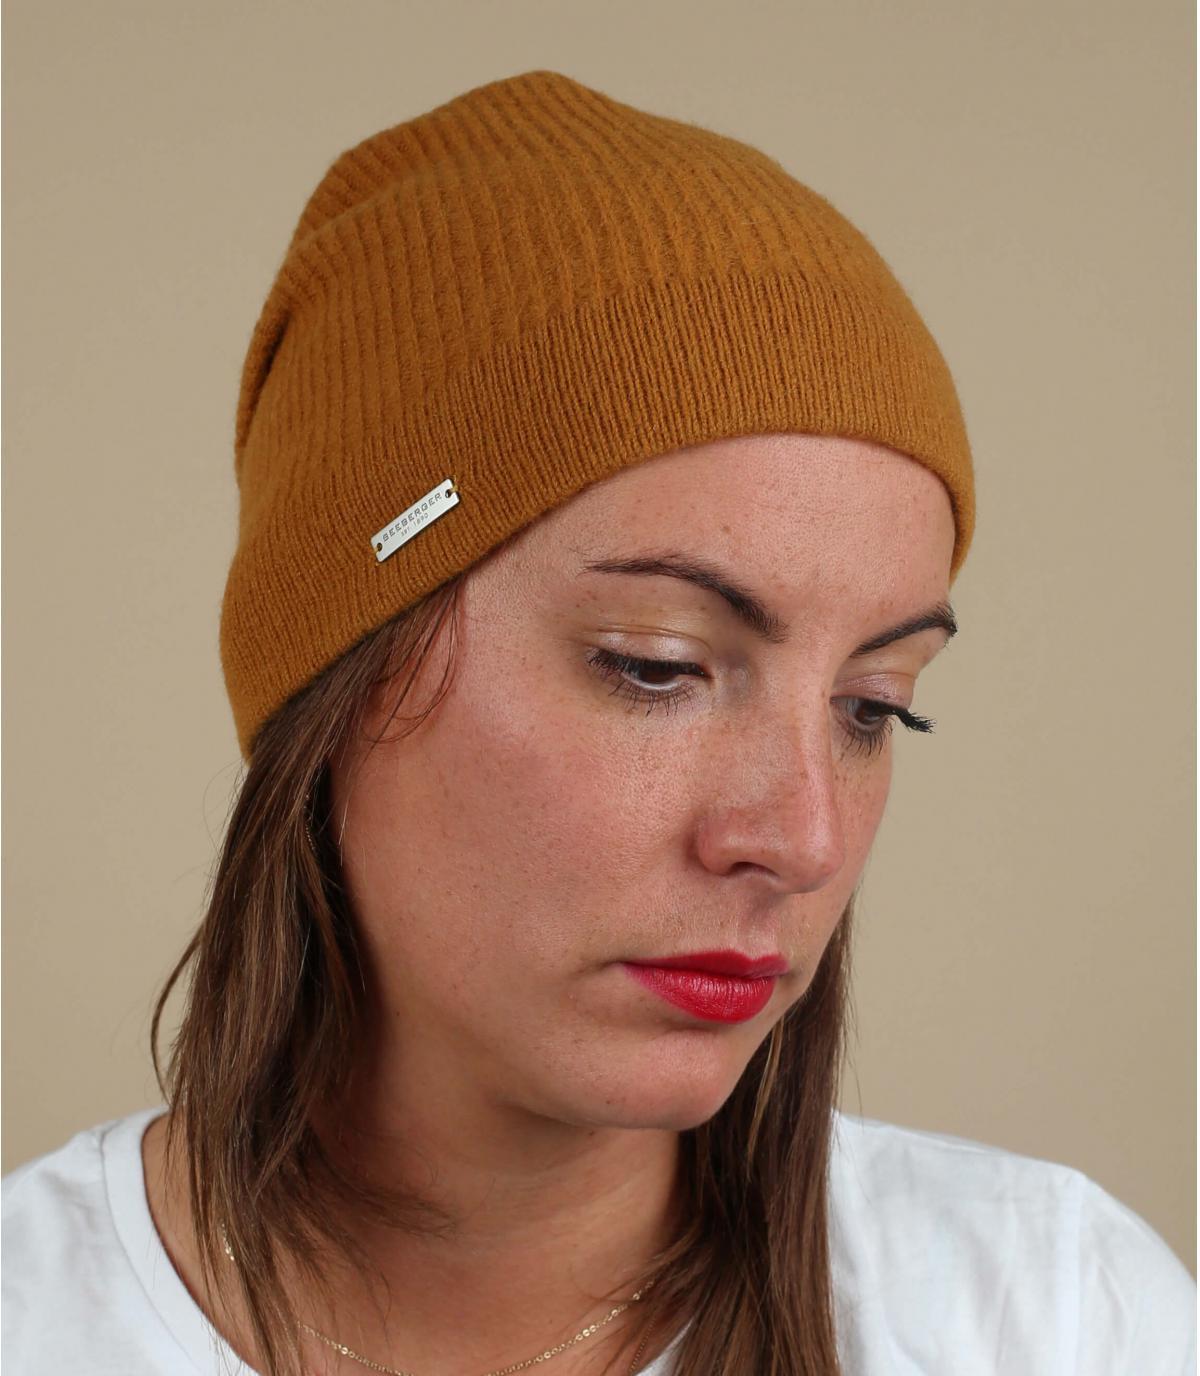 cappello di lana giallo lungo